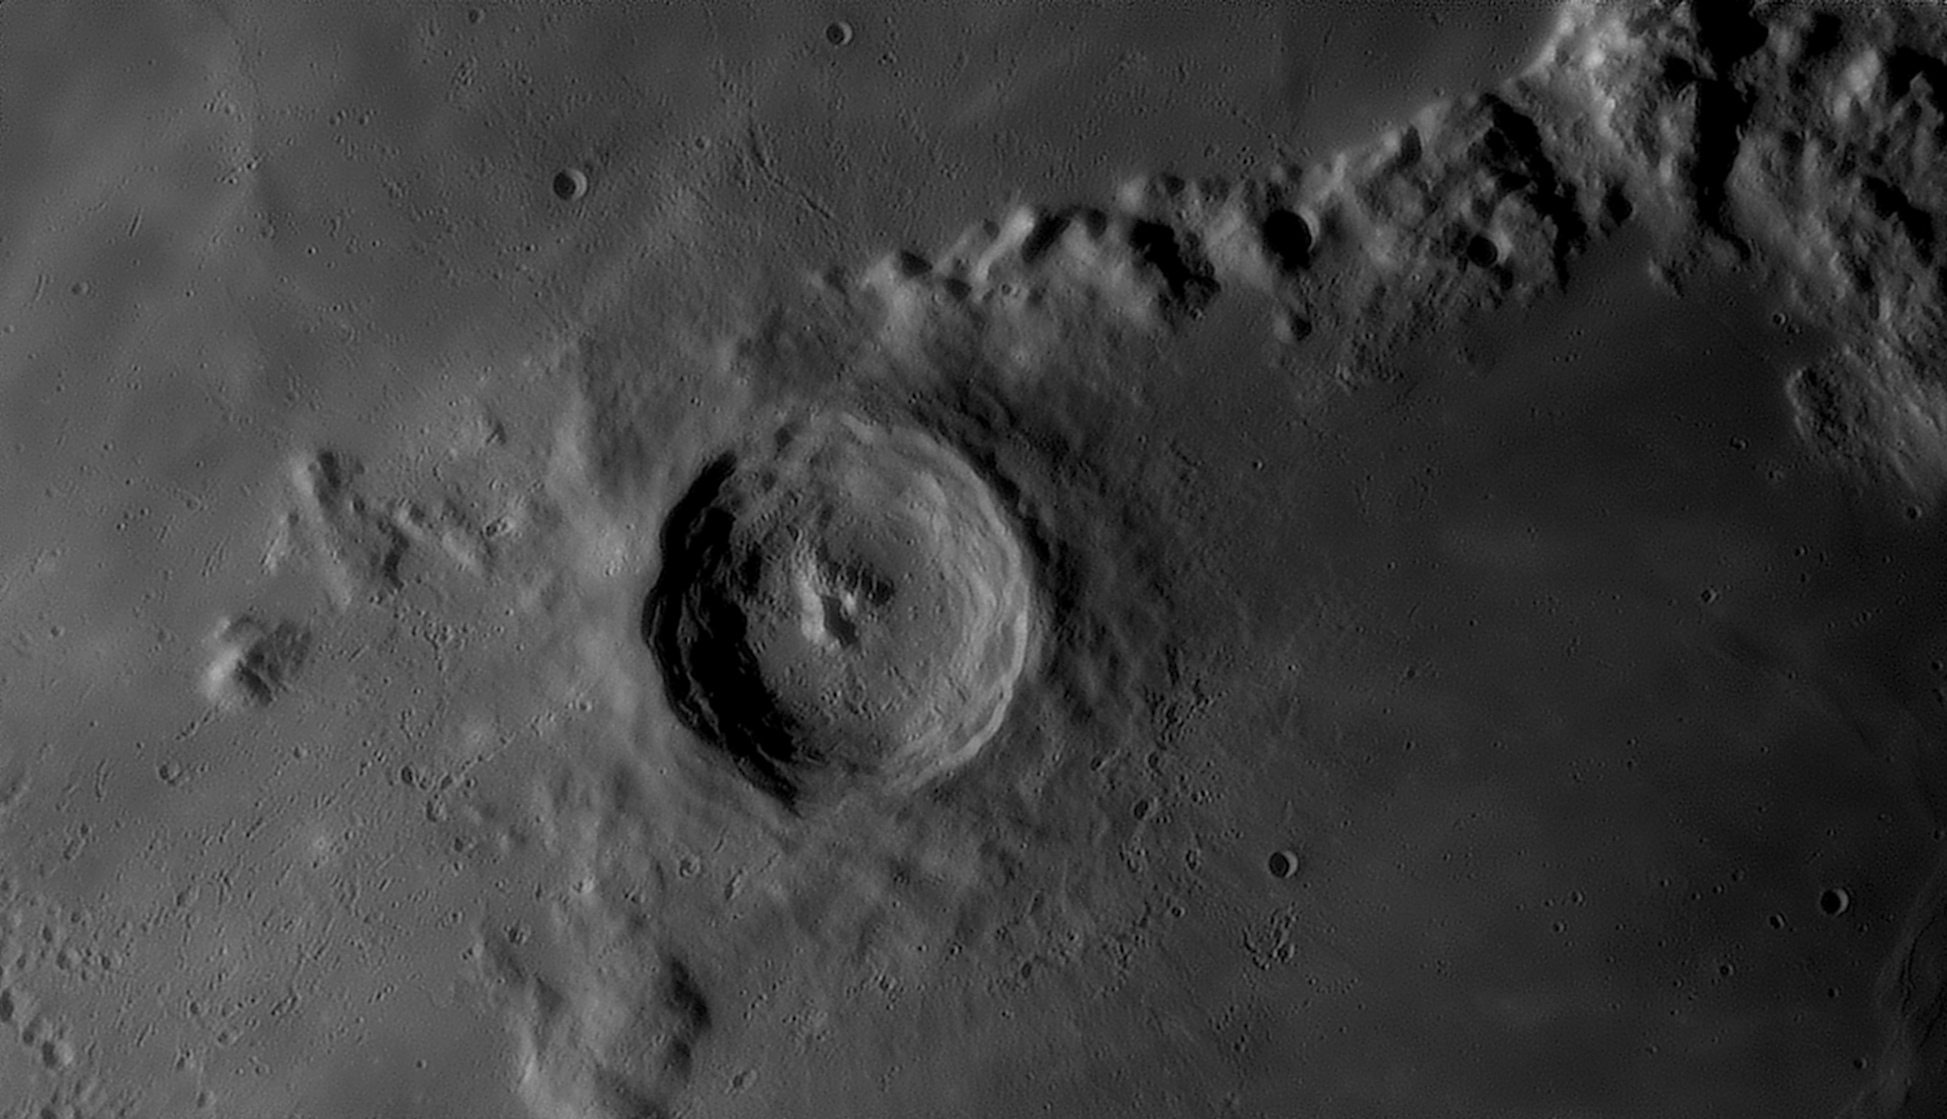 large.Moon_09_10_2020_02_51_36_R_.jpg.72f41c851c4cb6a4b11b76a0648f7fb9.jpg